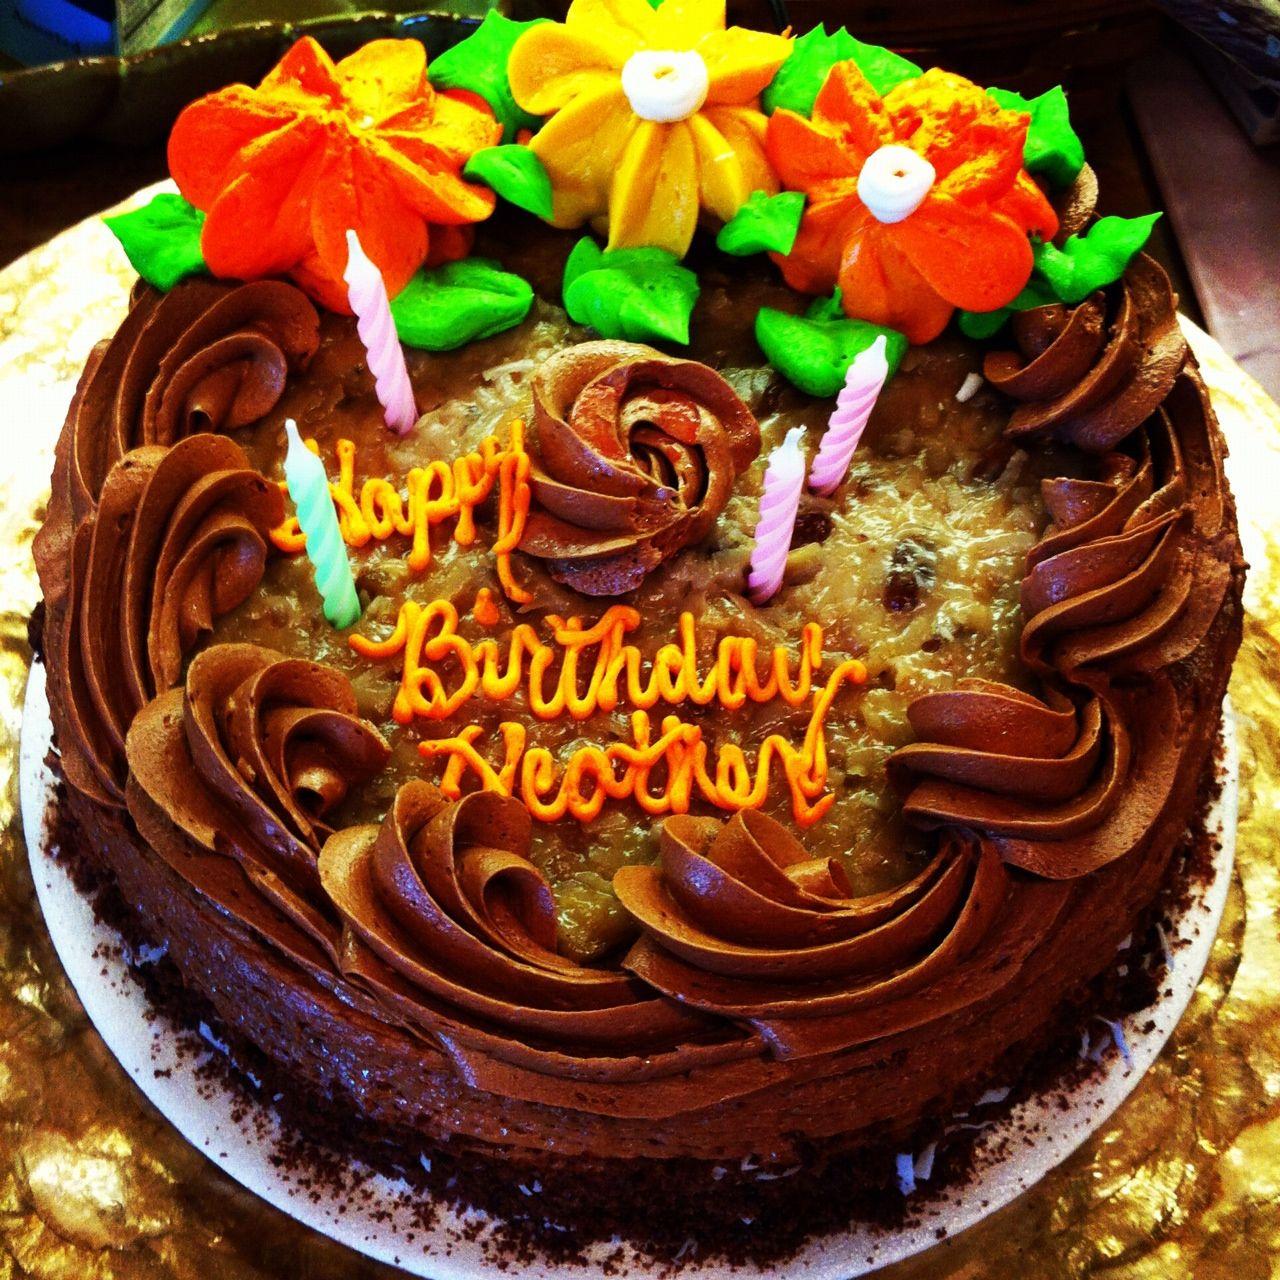 happy birthday brother cake hd wallpaper | happy birthday